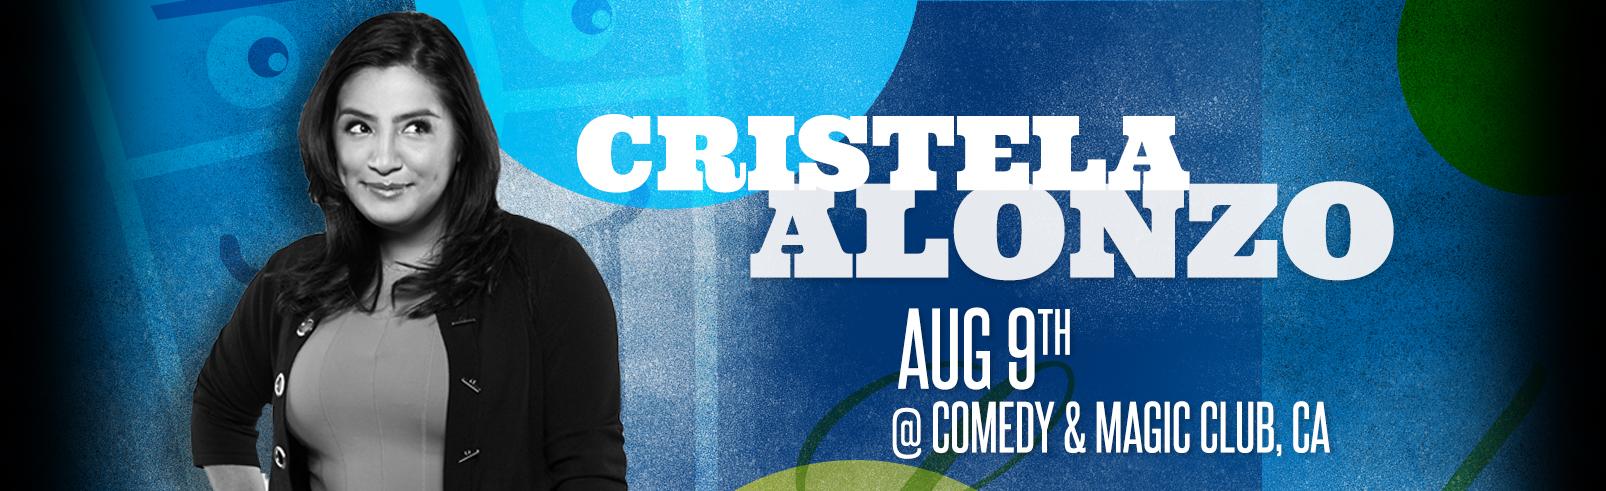 Cristela Alonzo @ Comedy and Magic Club